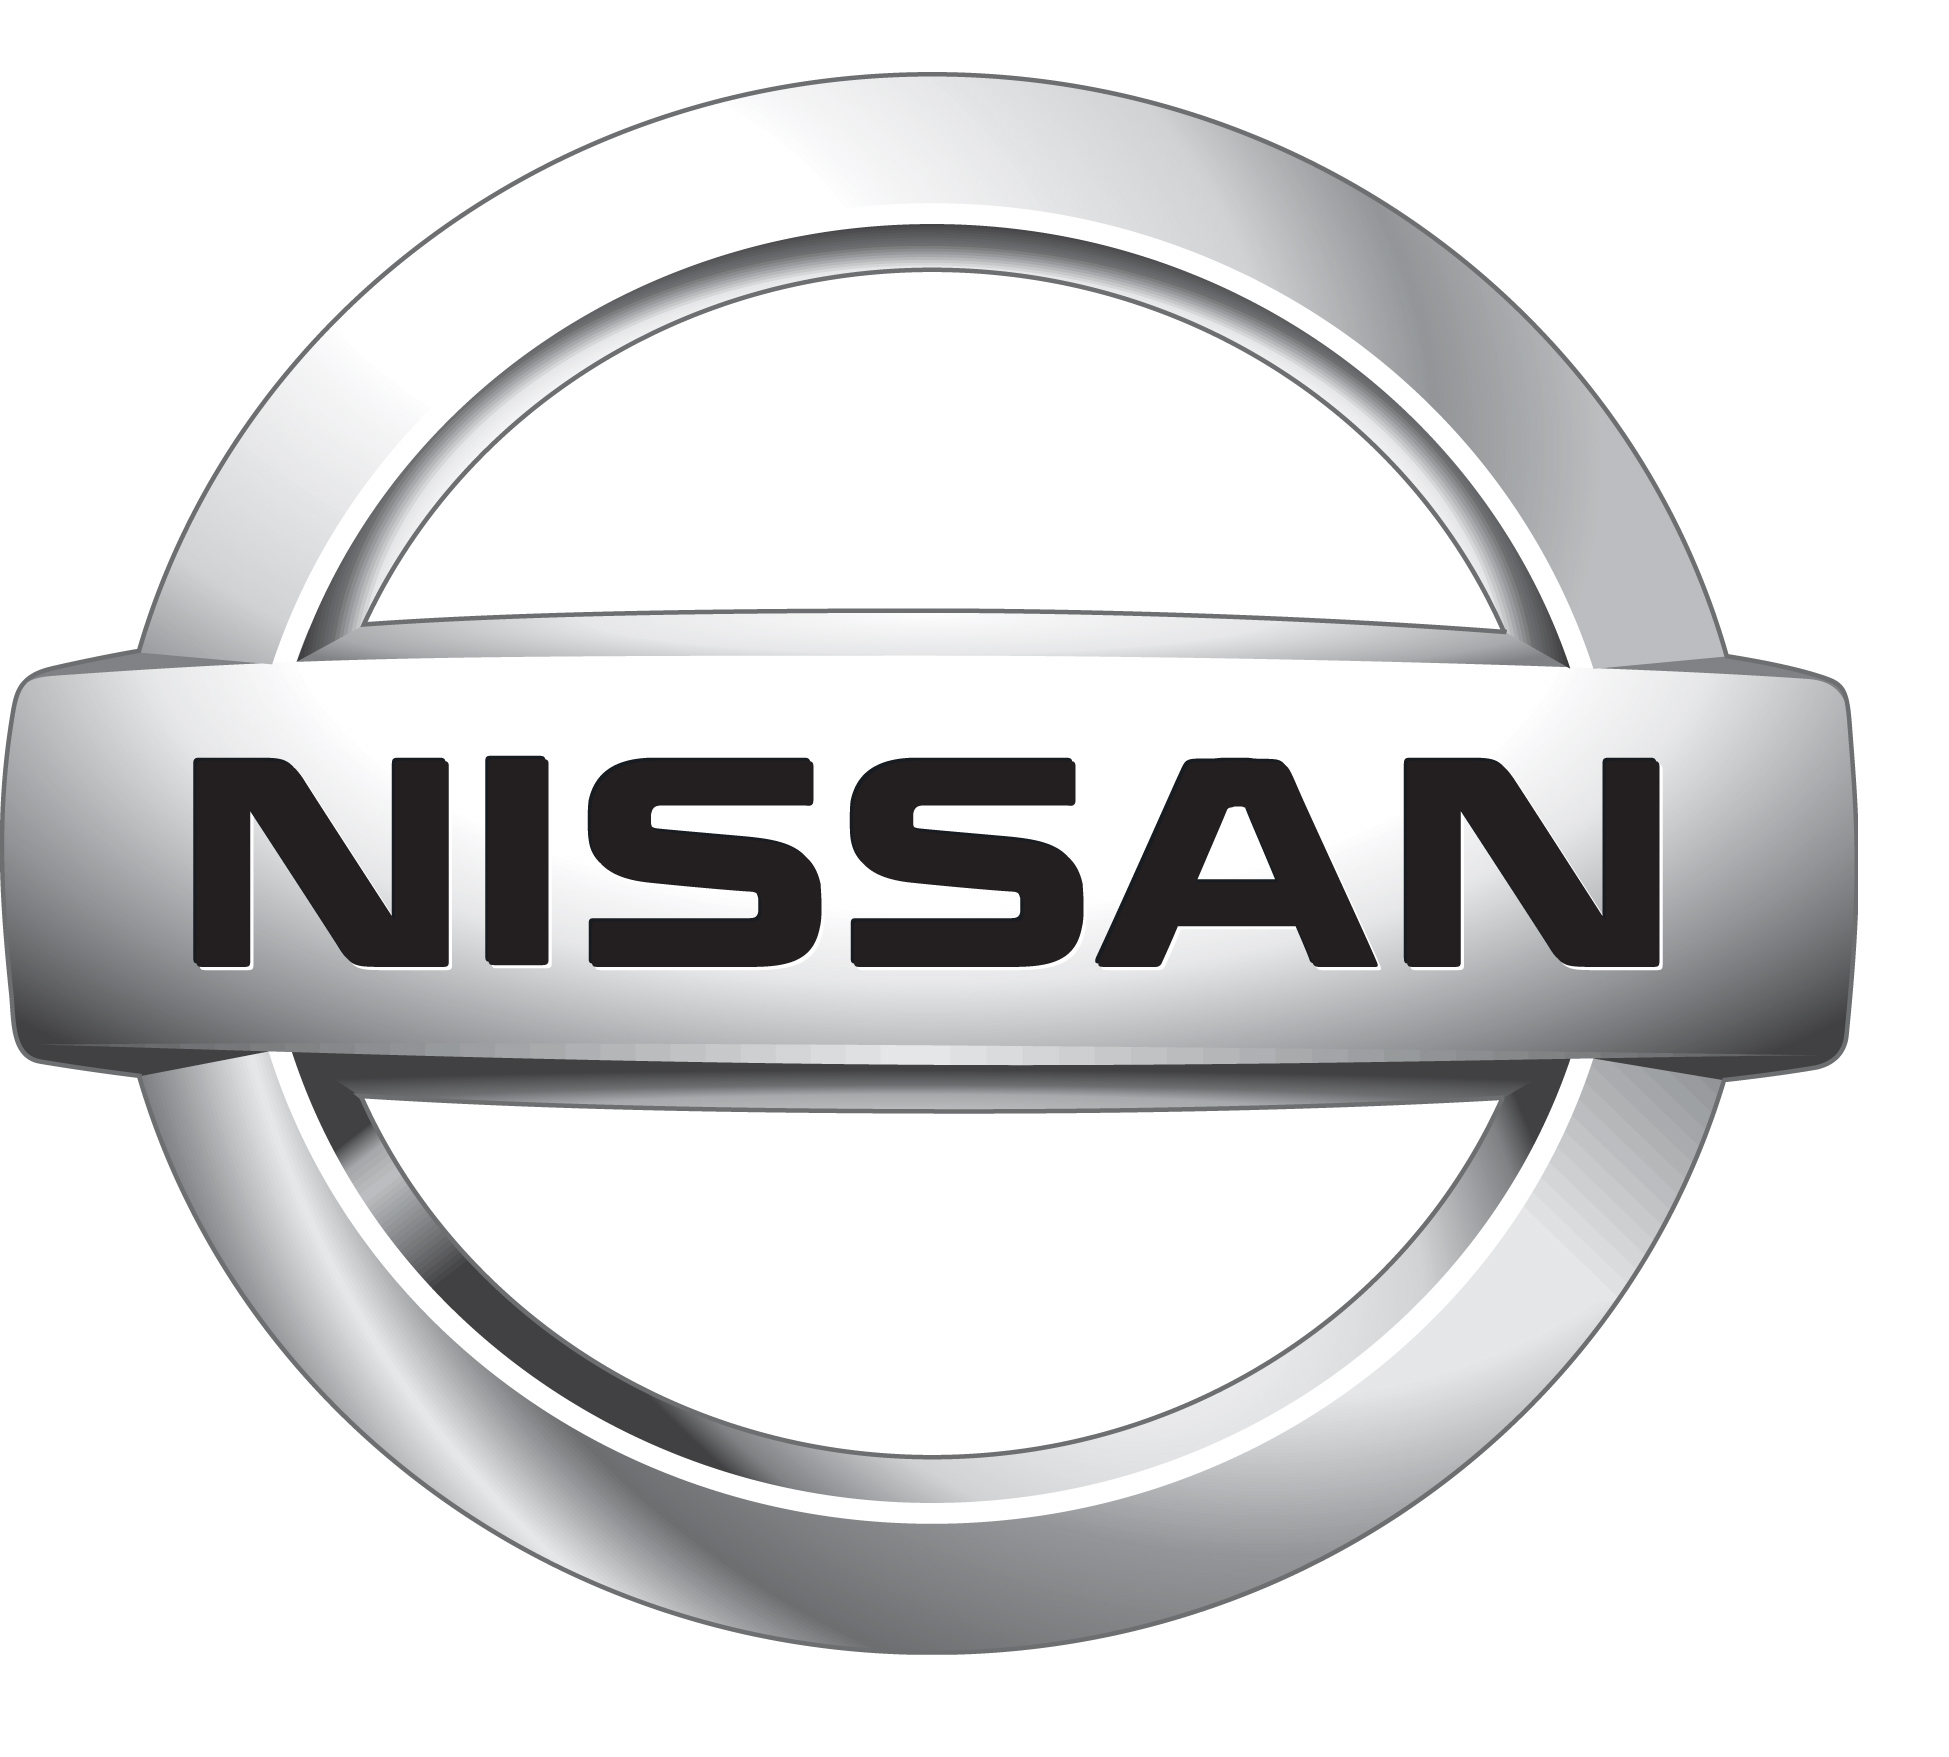 nissan logo, nissan symbol, nissan emblem, car logo